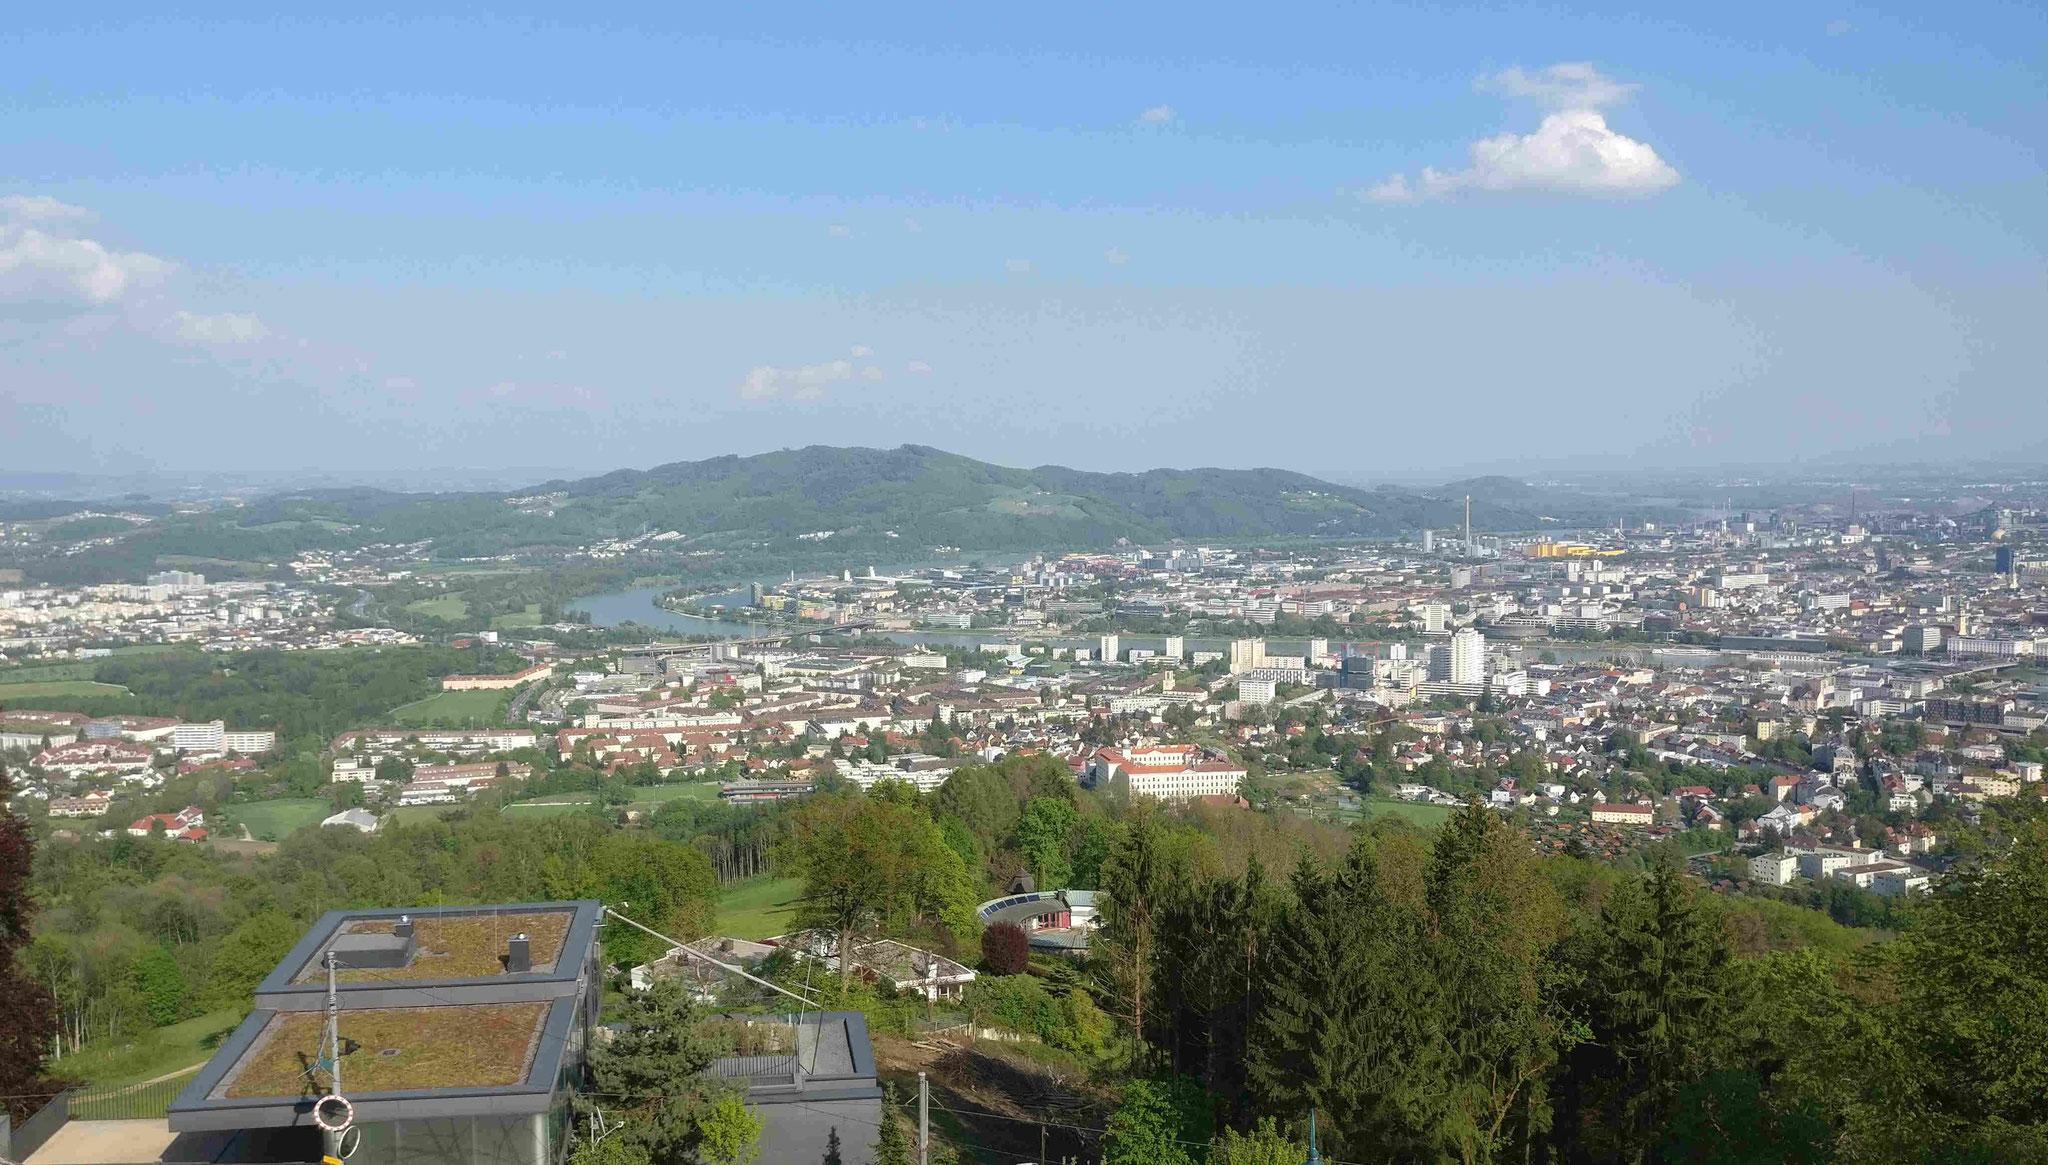 Blick auf Linz vom Pöstlingberg